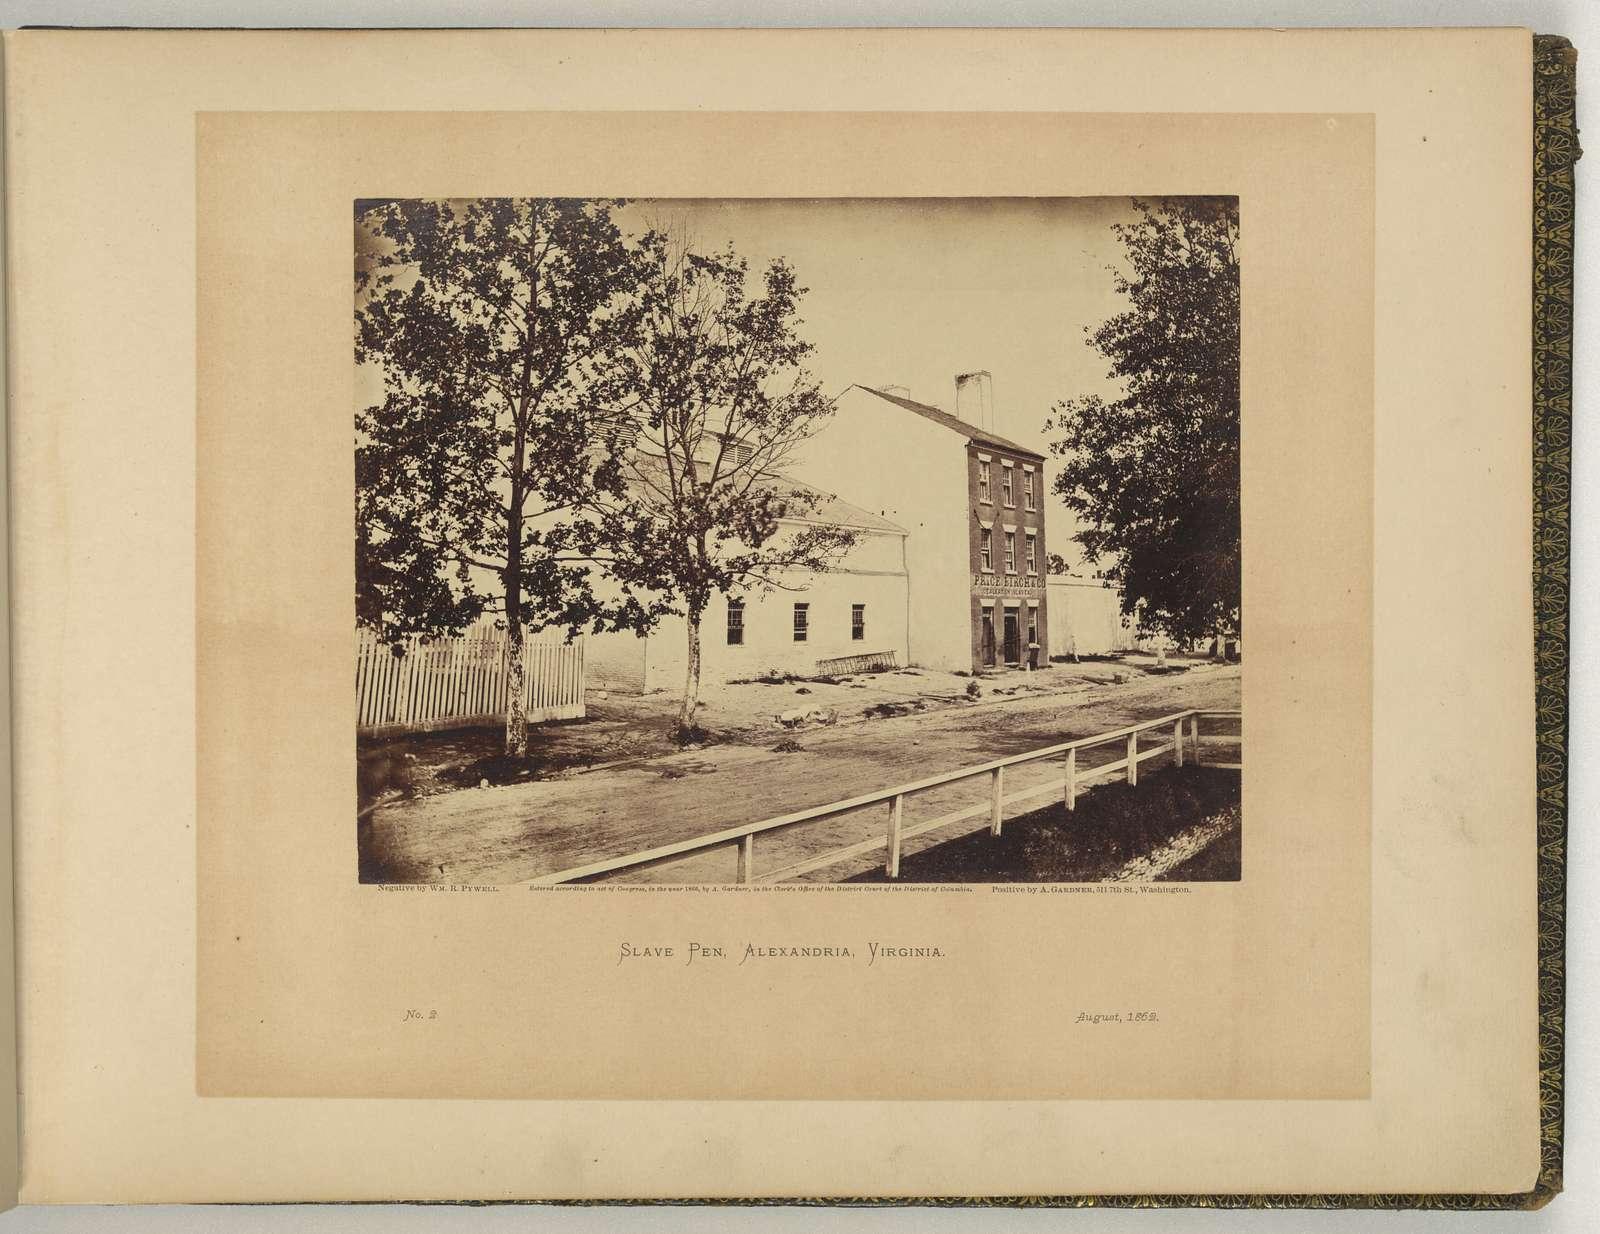 Slave pen, Alexandria, Virginia / negative by Wm. R. Pywell ; positive by A Gardner.